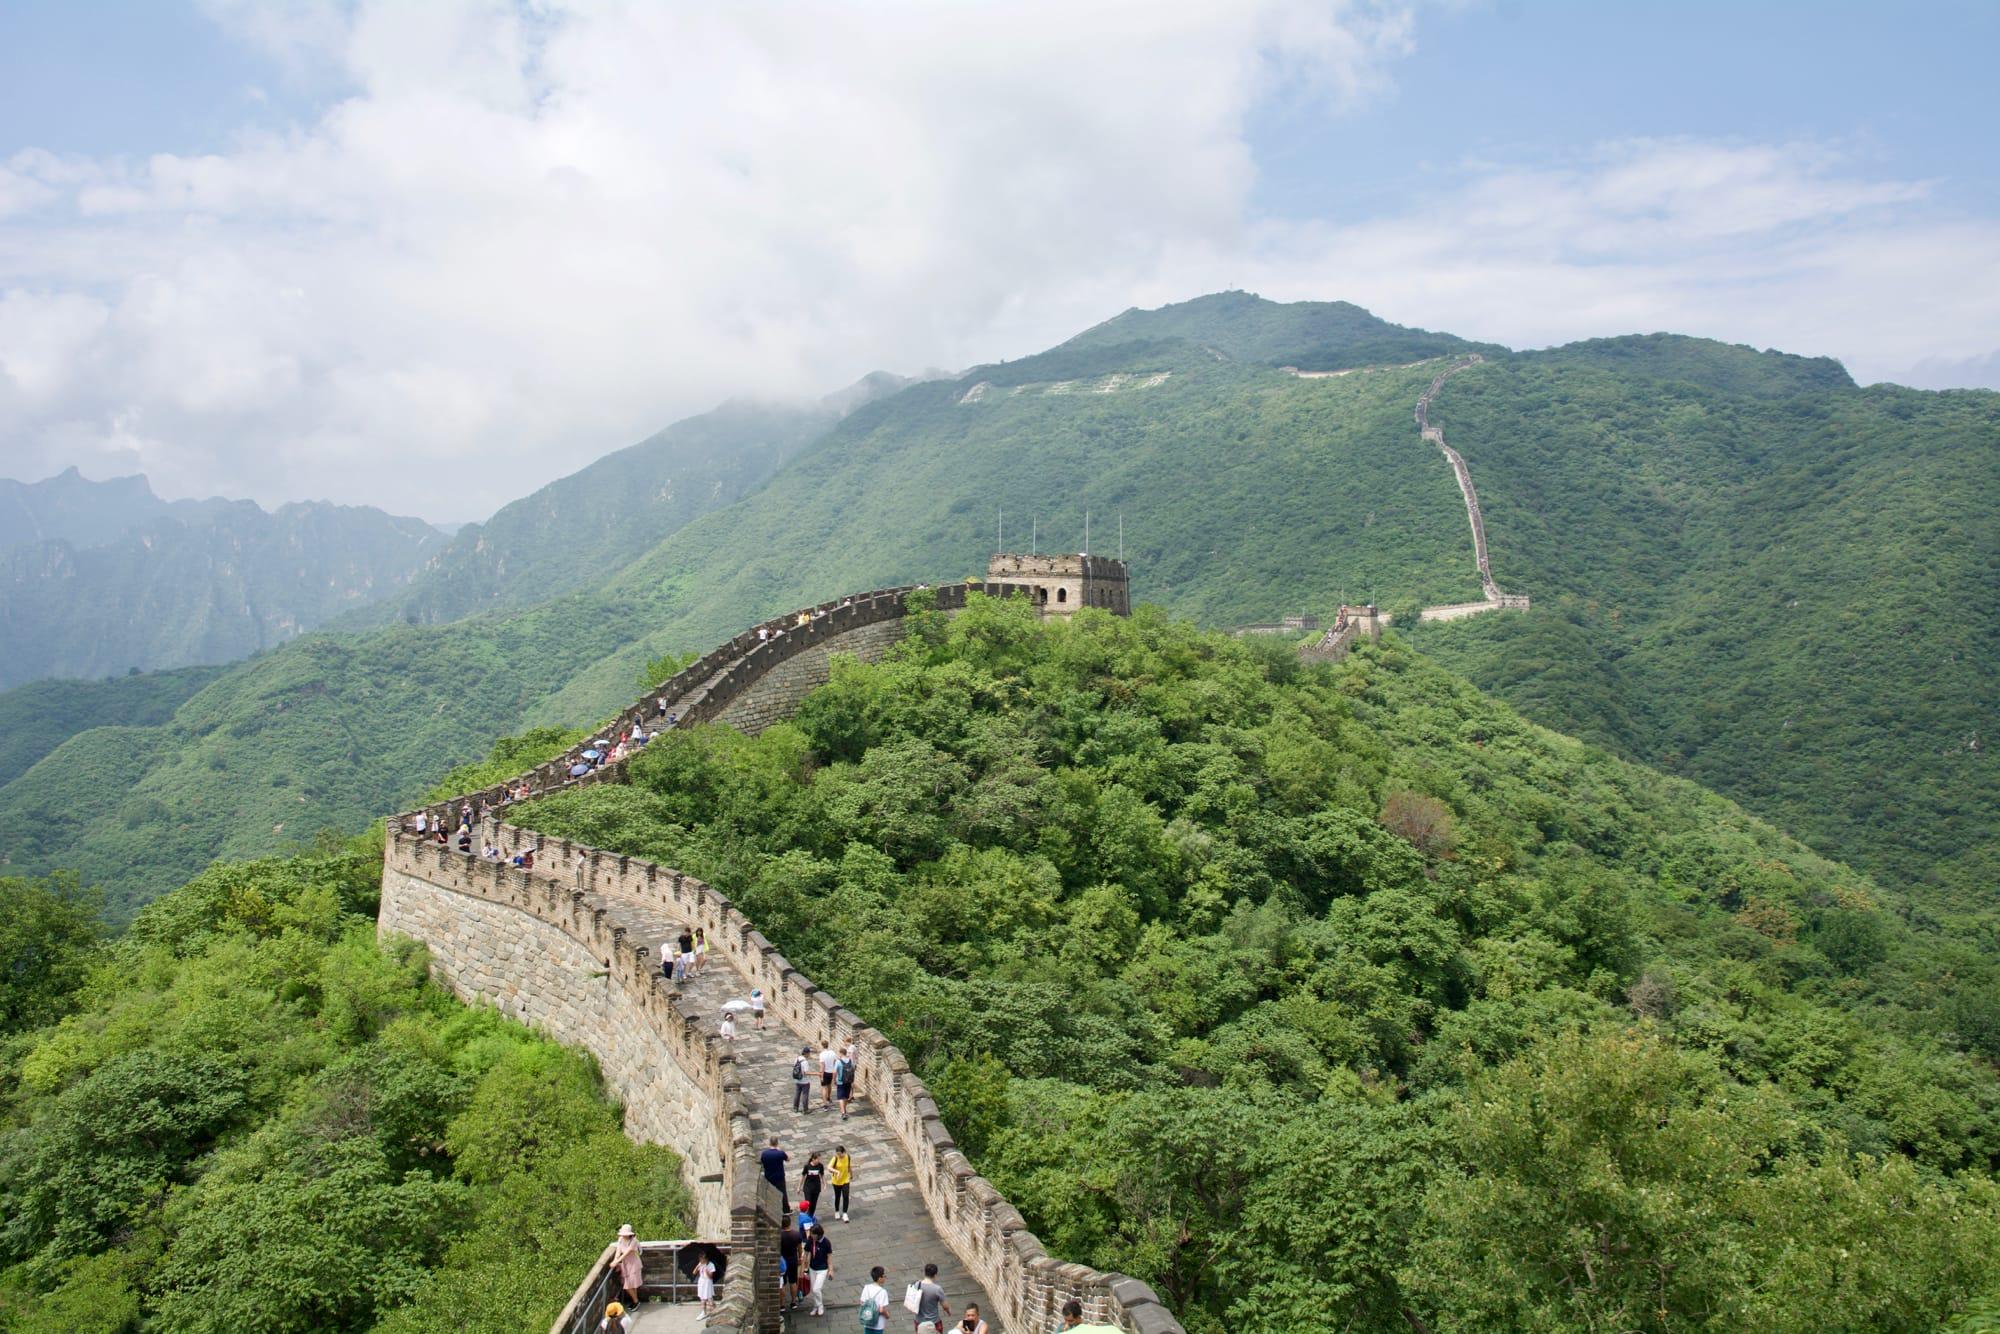 Beijing: la Grande Muraglia